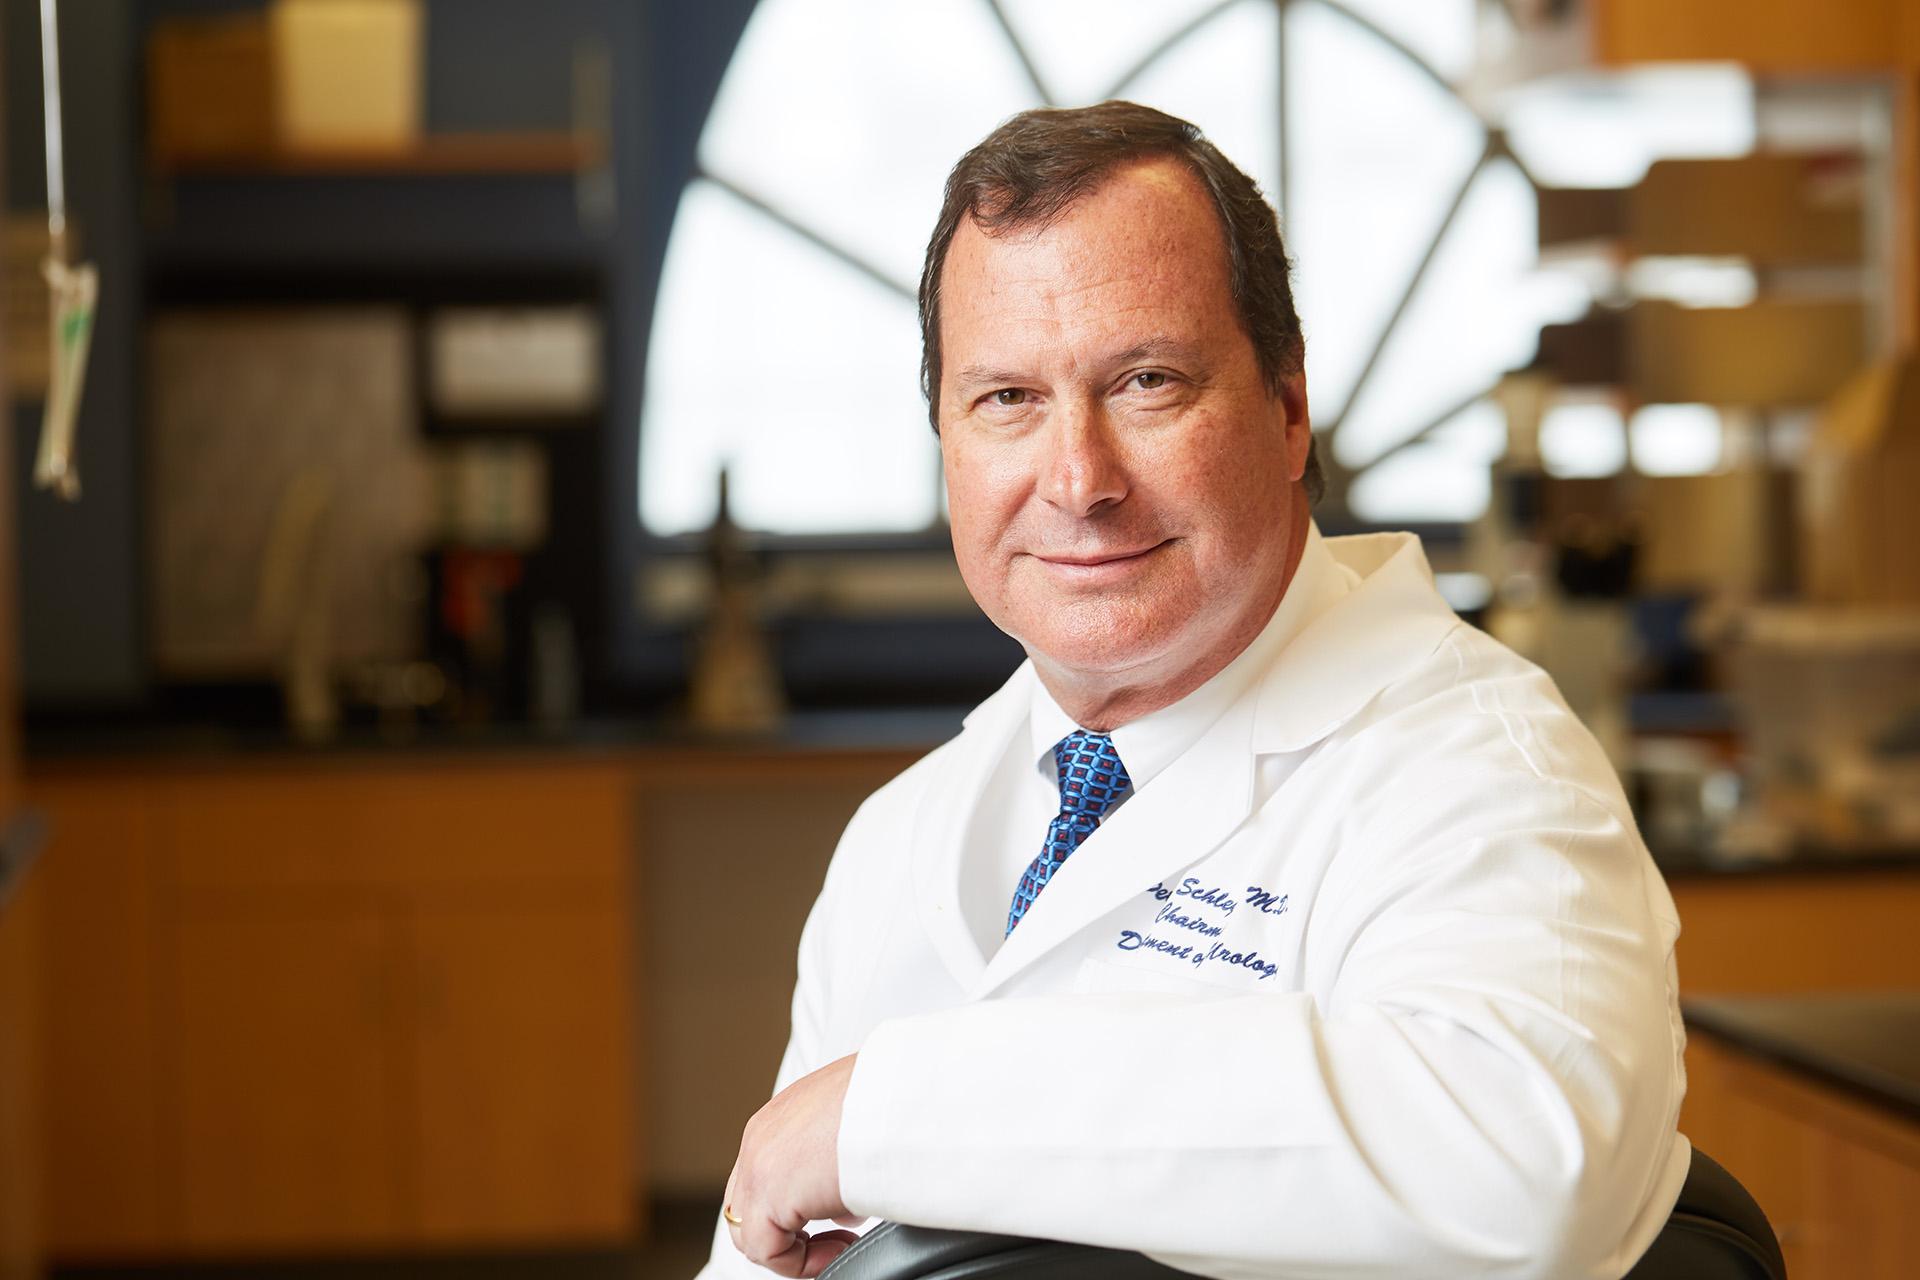 Dr. Peter Schlegel